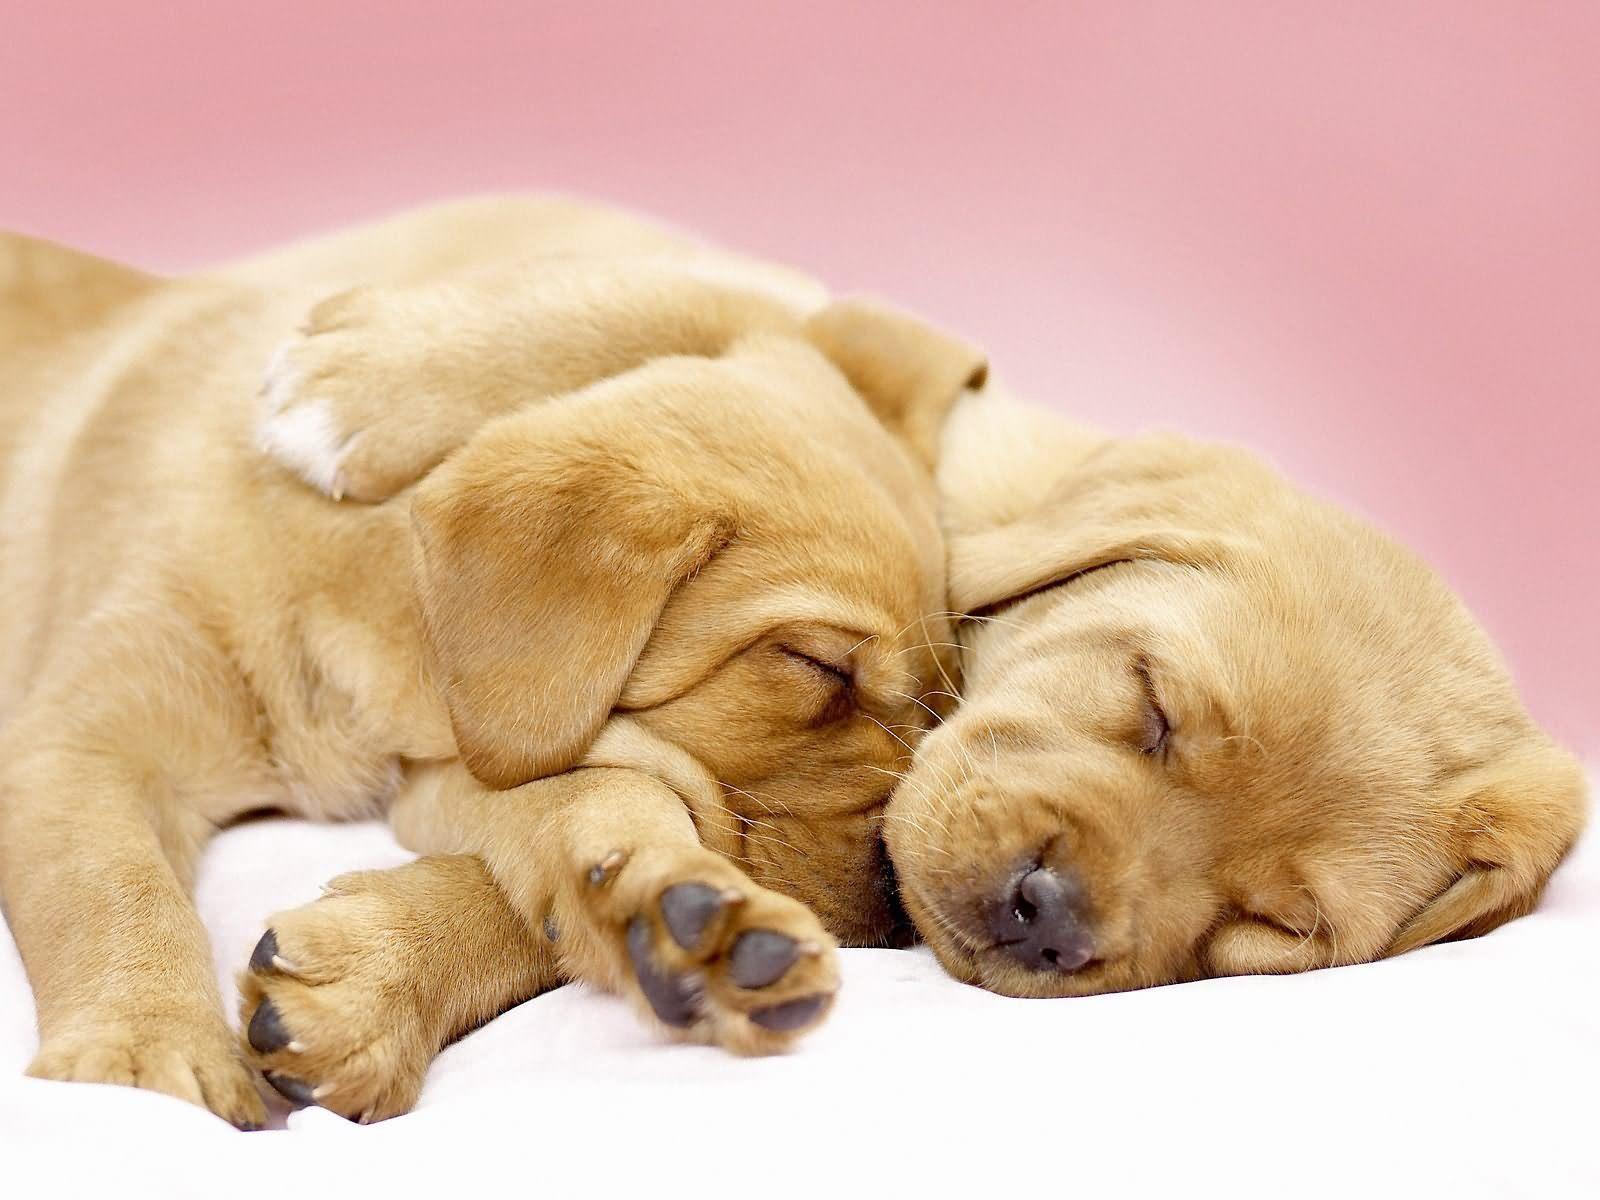 free hd dog wallpapers | hd wallpapers | pinterest | sleeping baby